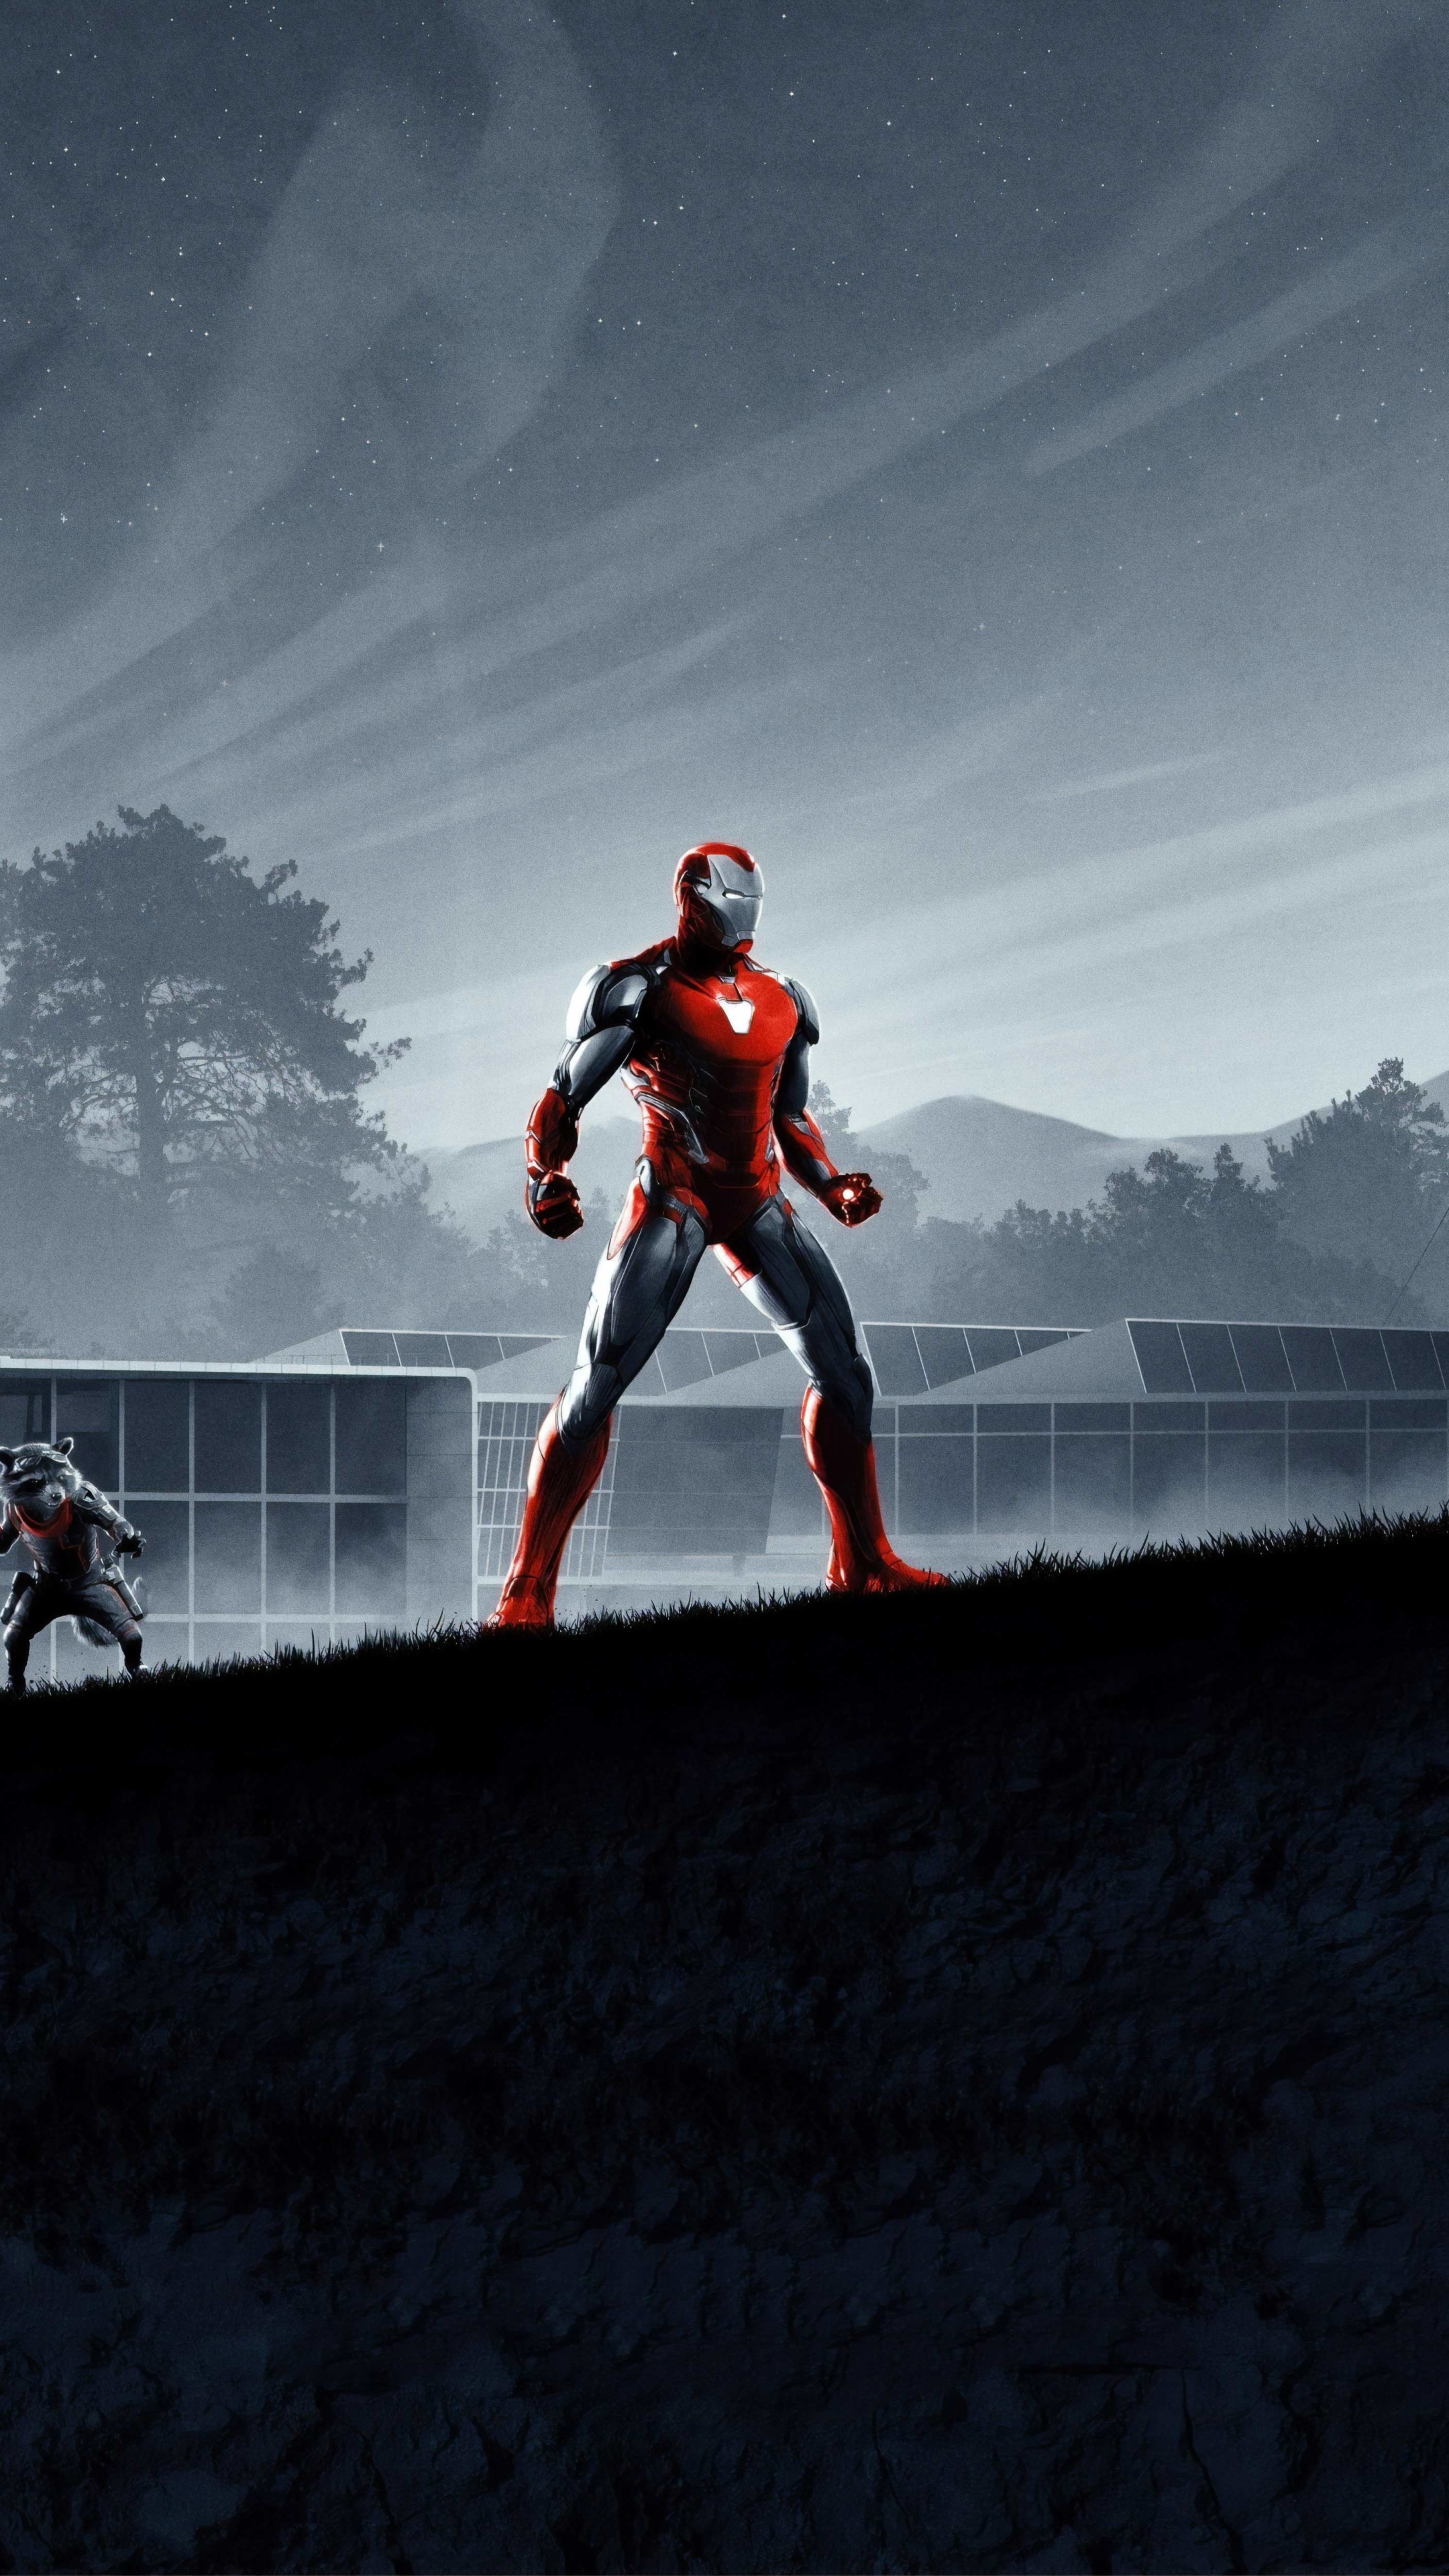 2160x3840 Avengers Endgame New 4k 8k Poster Sony Xperia X Xz Z5